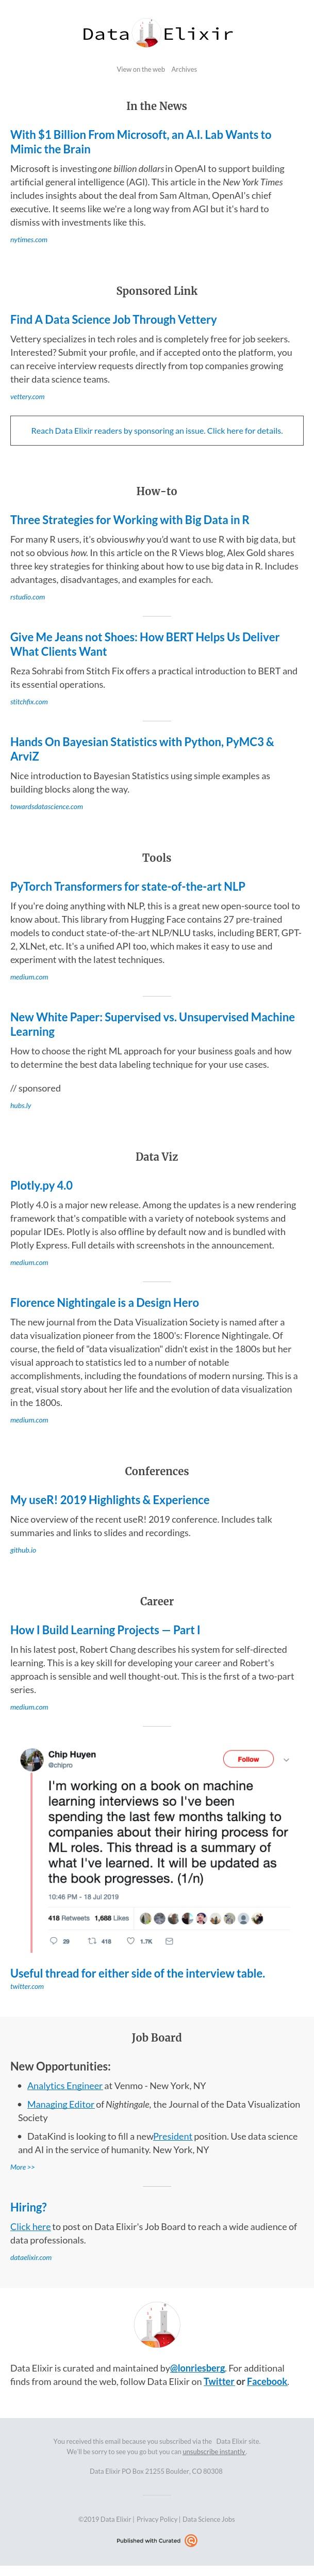 Data Elixir - Issue 243